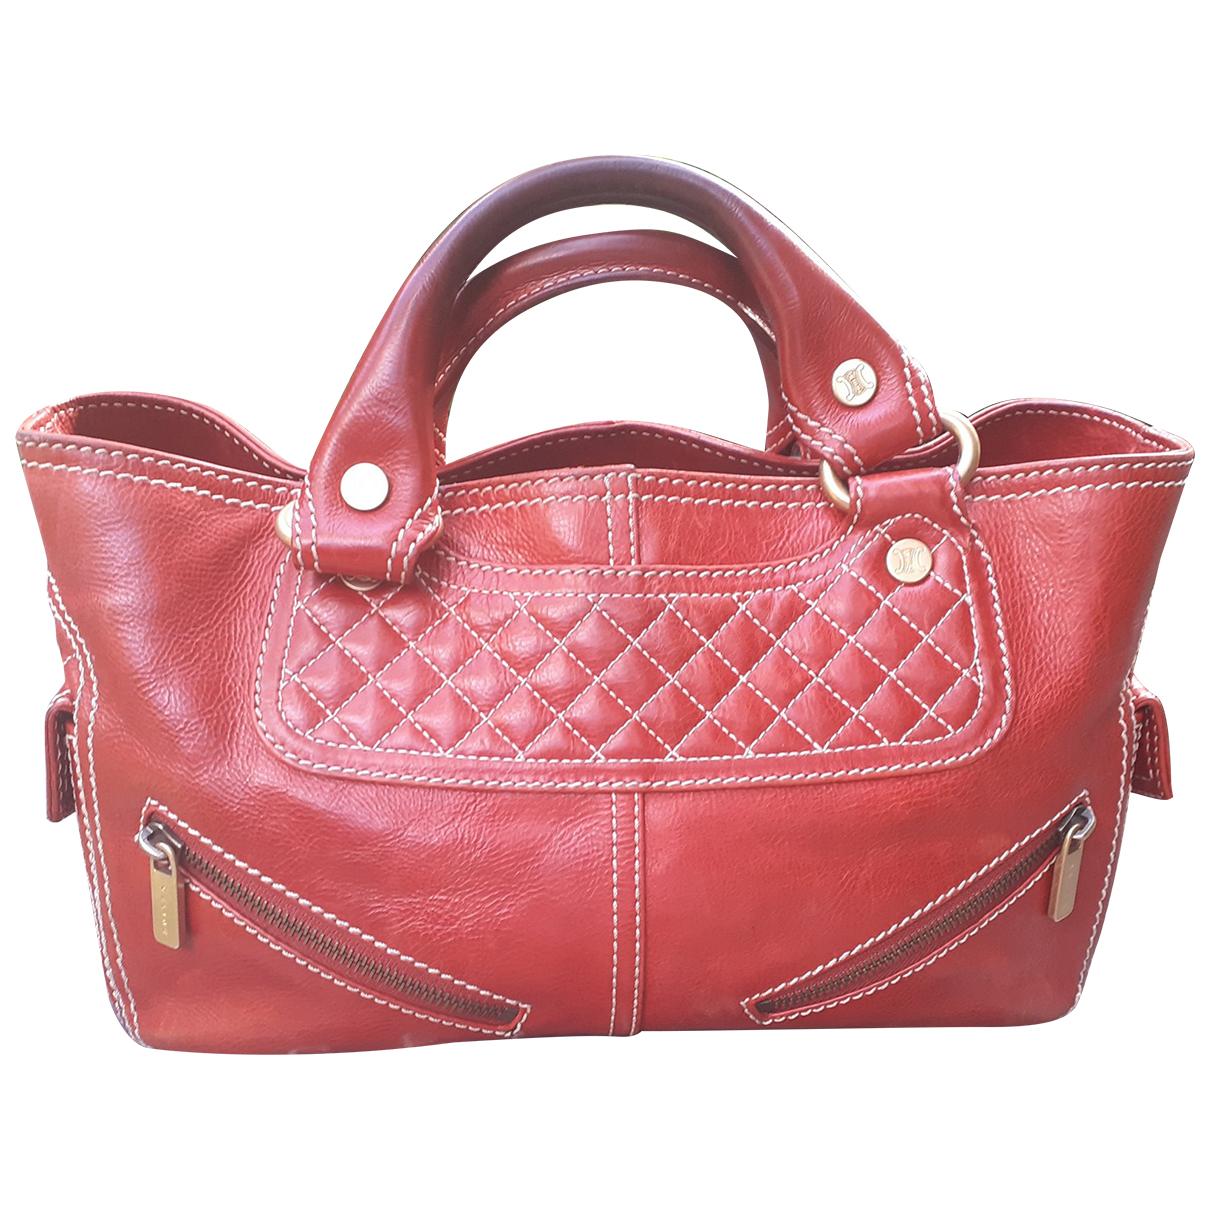 Celine Boogie Handtasche in  Rot Leder